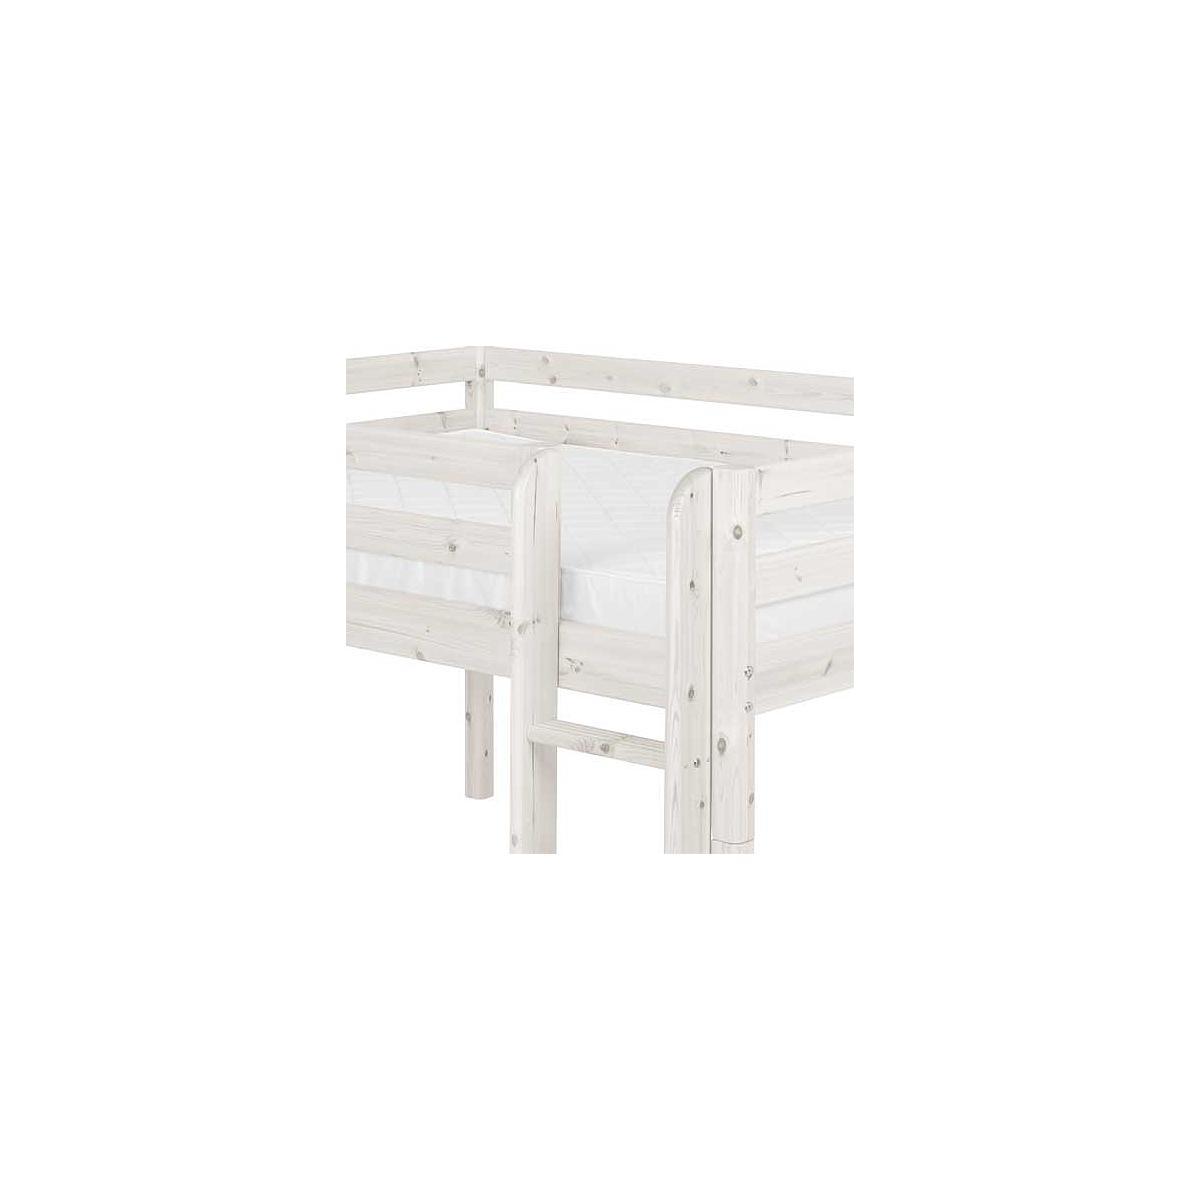 Cama doble media alta 140x190 CLASSIC Flexa blanco cal